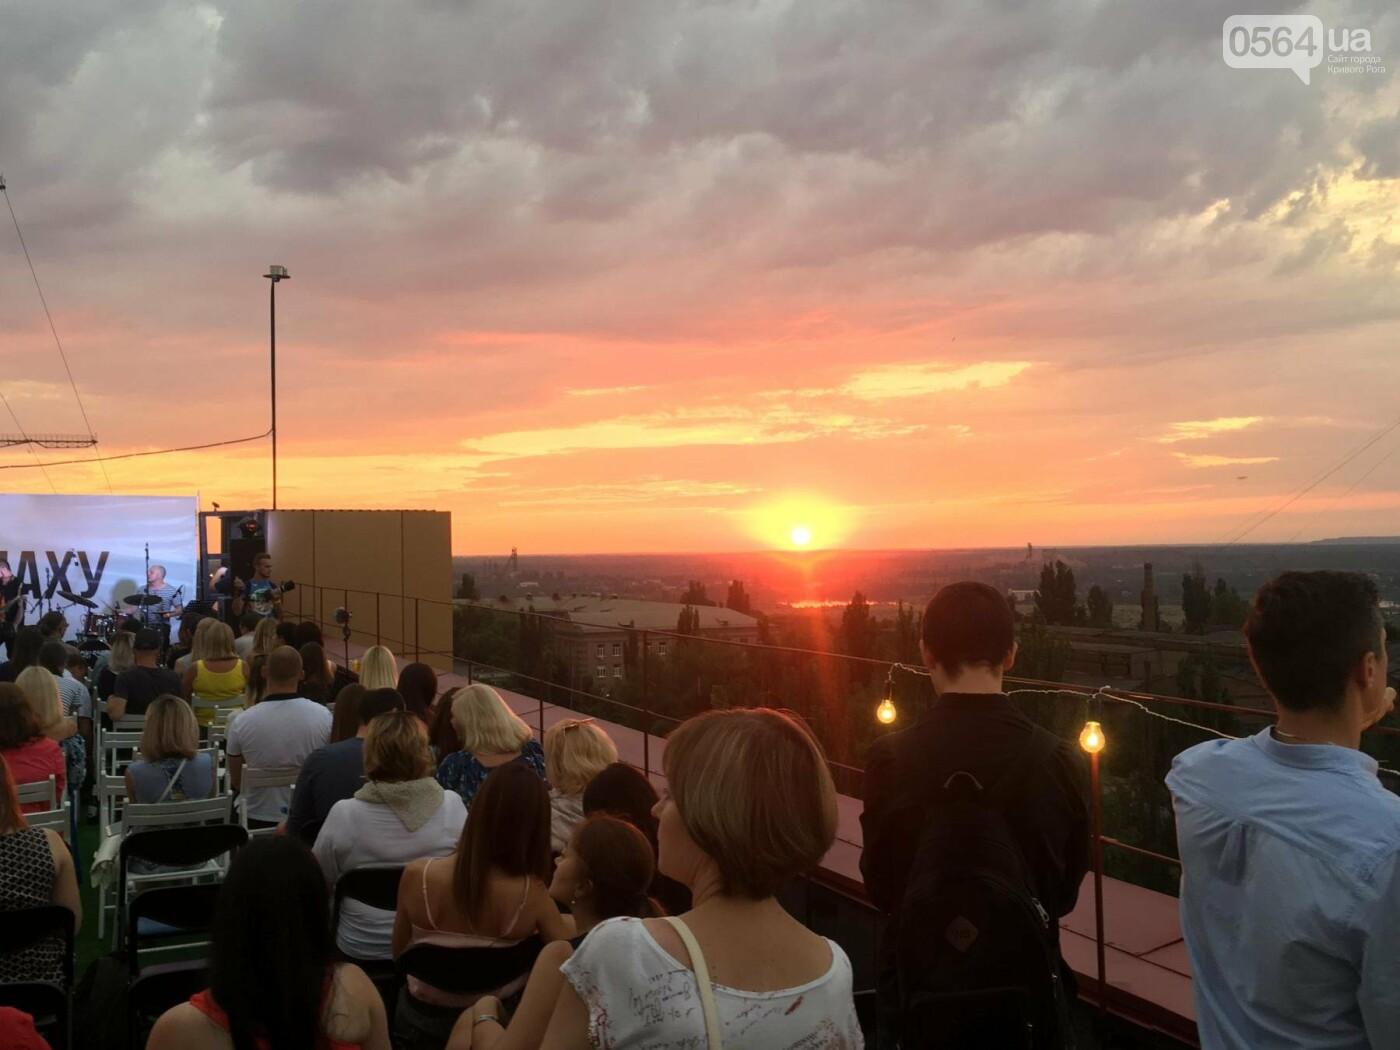 Сотни криворожан встречали закат на крыше отеля под мелодии джаза, - ФОТО, ВИДЕО, фото-24